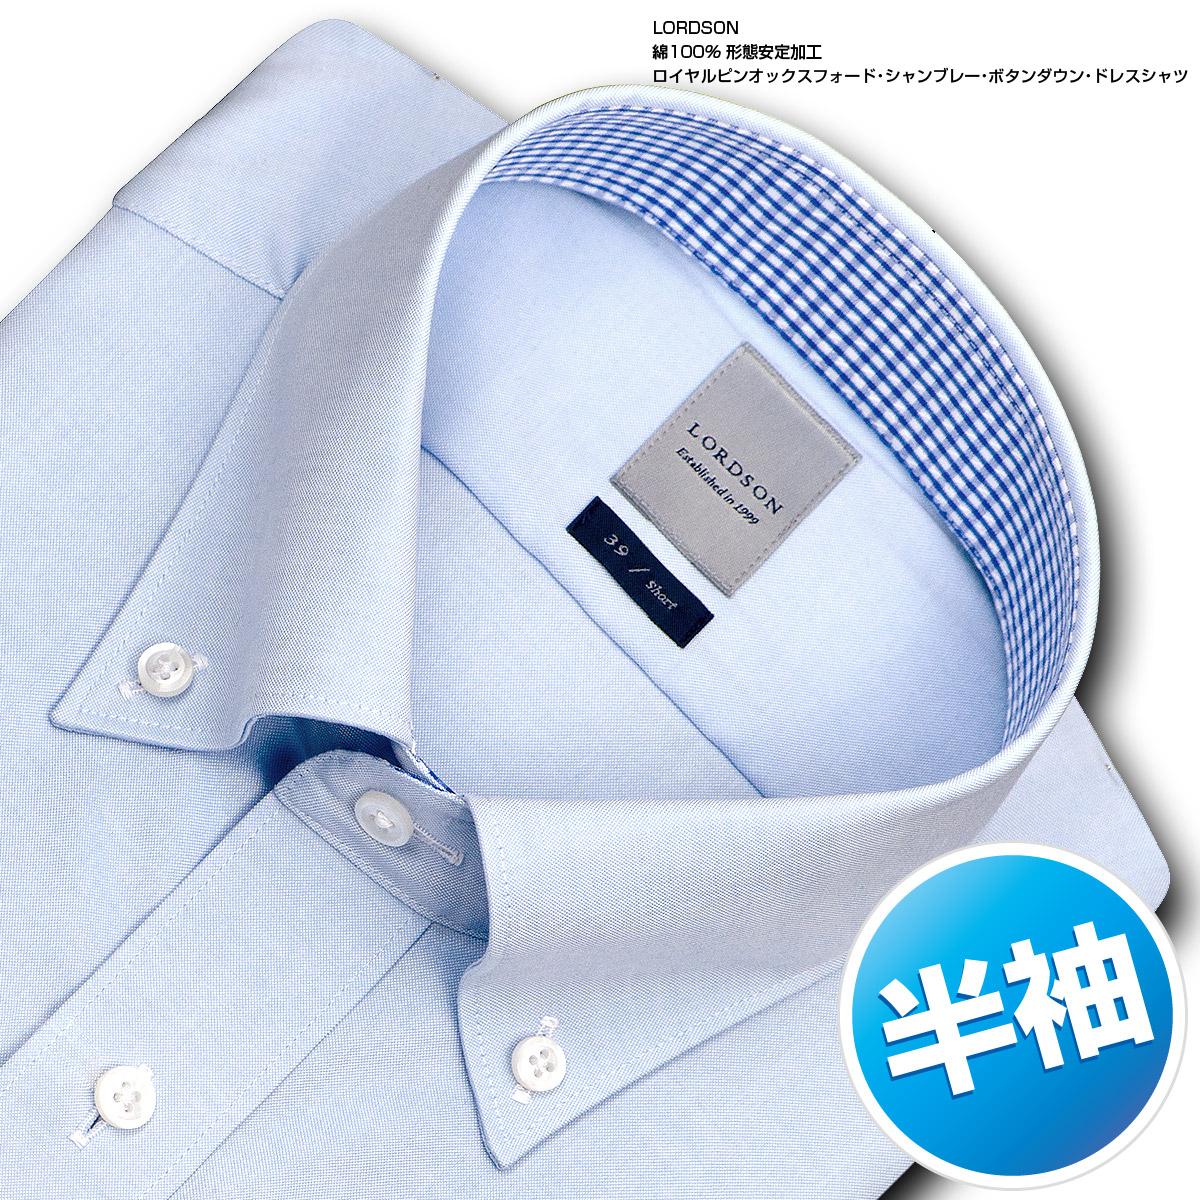 LORDSON 半袖ワイシャツ メンズ 夏 形態安定加工 ロイヤルピンオックスフォード シャンブレー ボタンダウン ドレスシャツ|綿:100% ブルー(zon504-150)